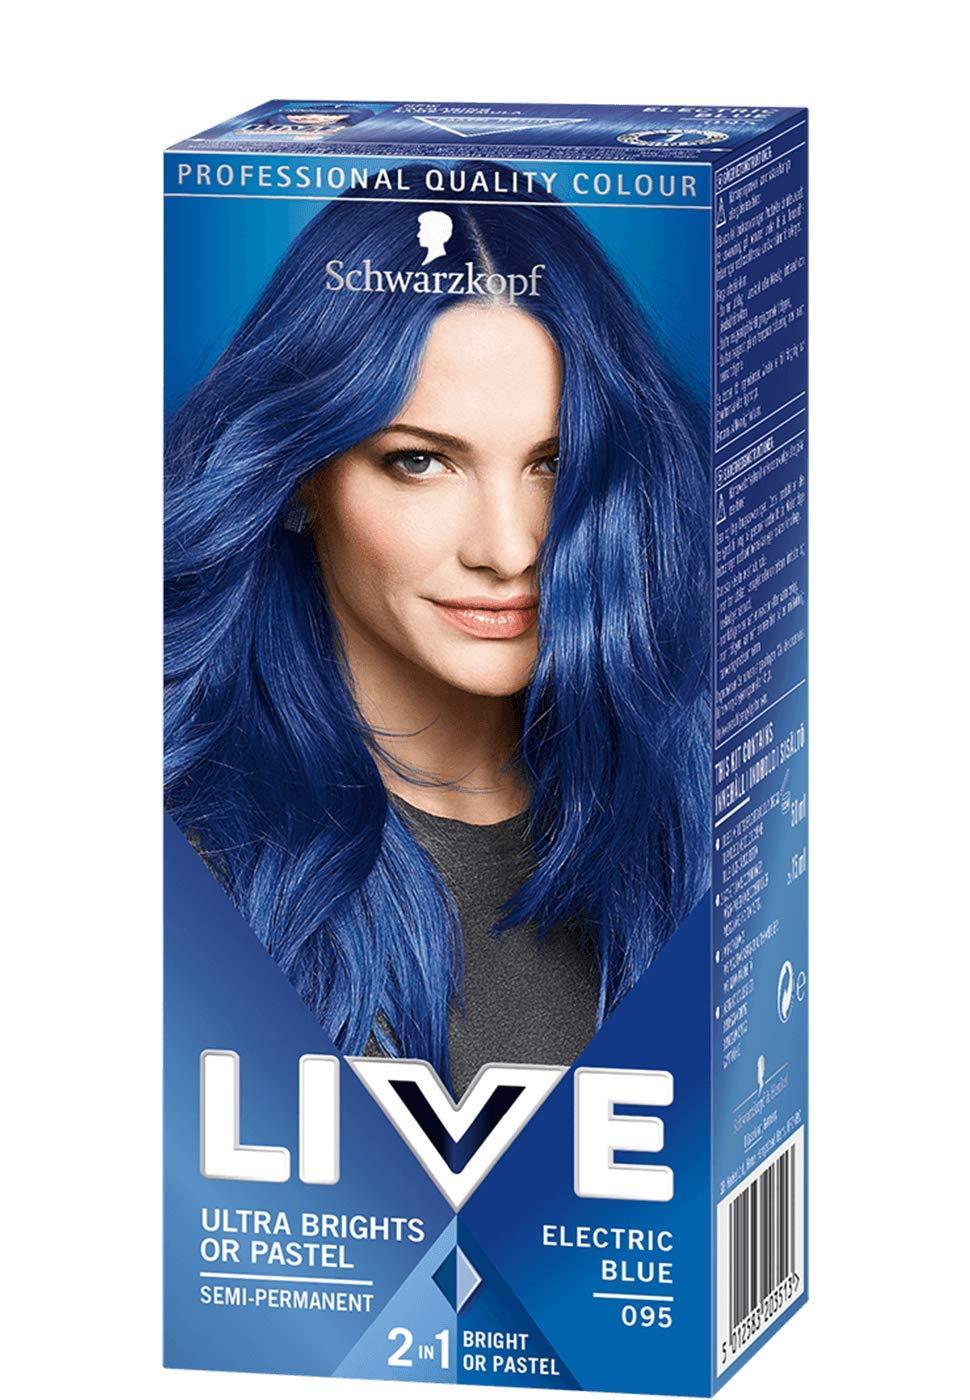 Schwarzkopf Live Ultra Brights 095 Electric Blue Hair Dye